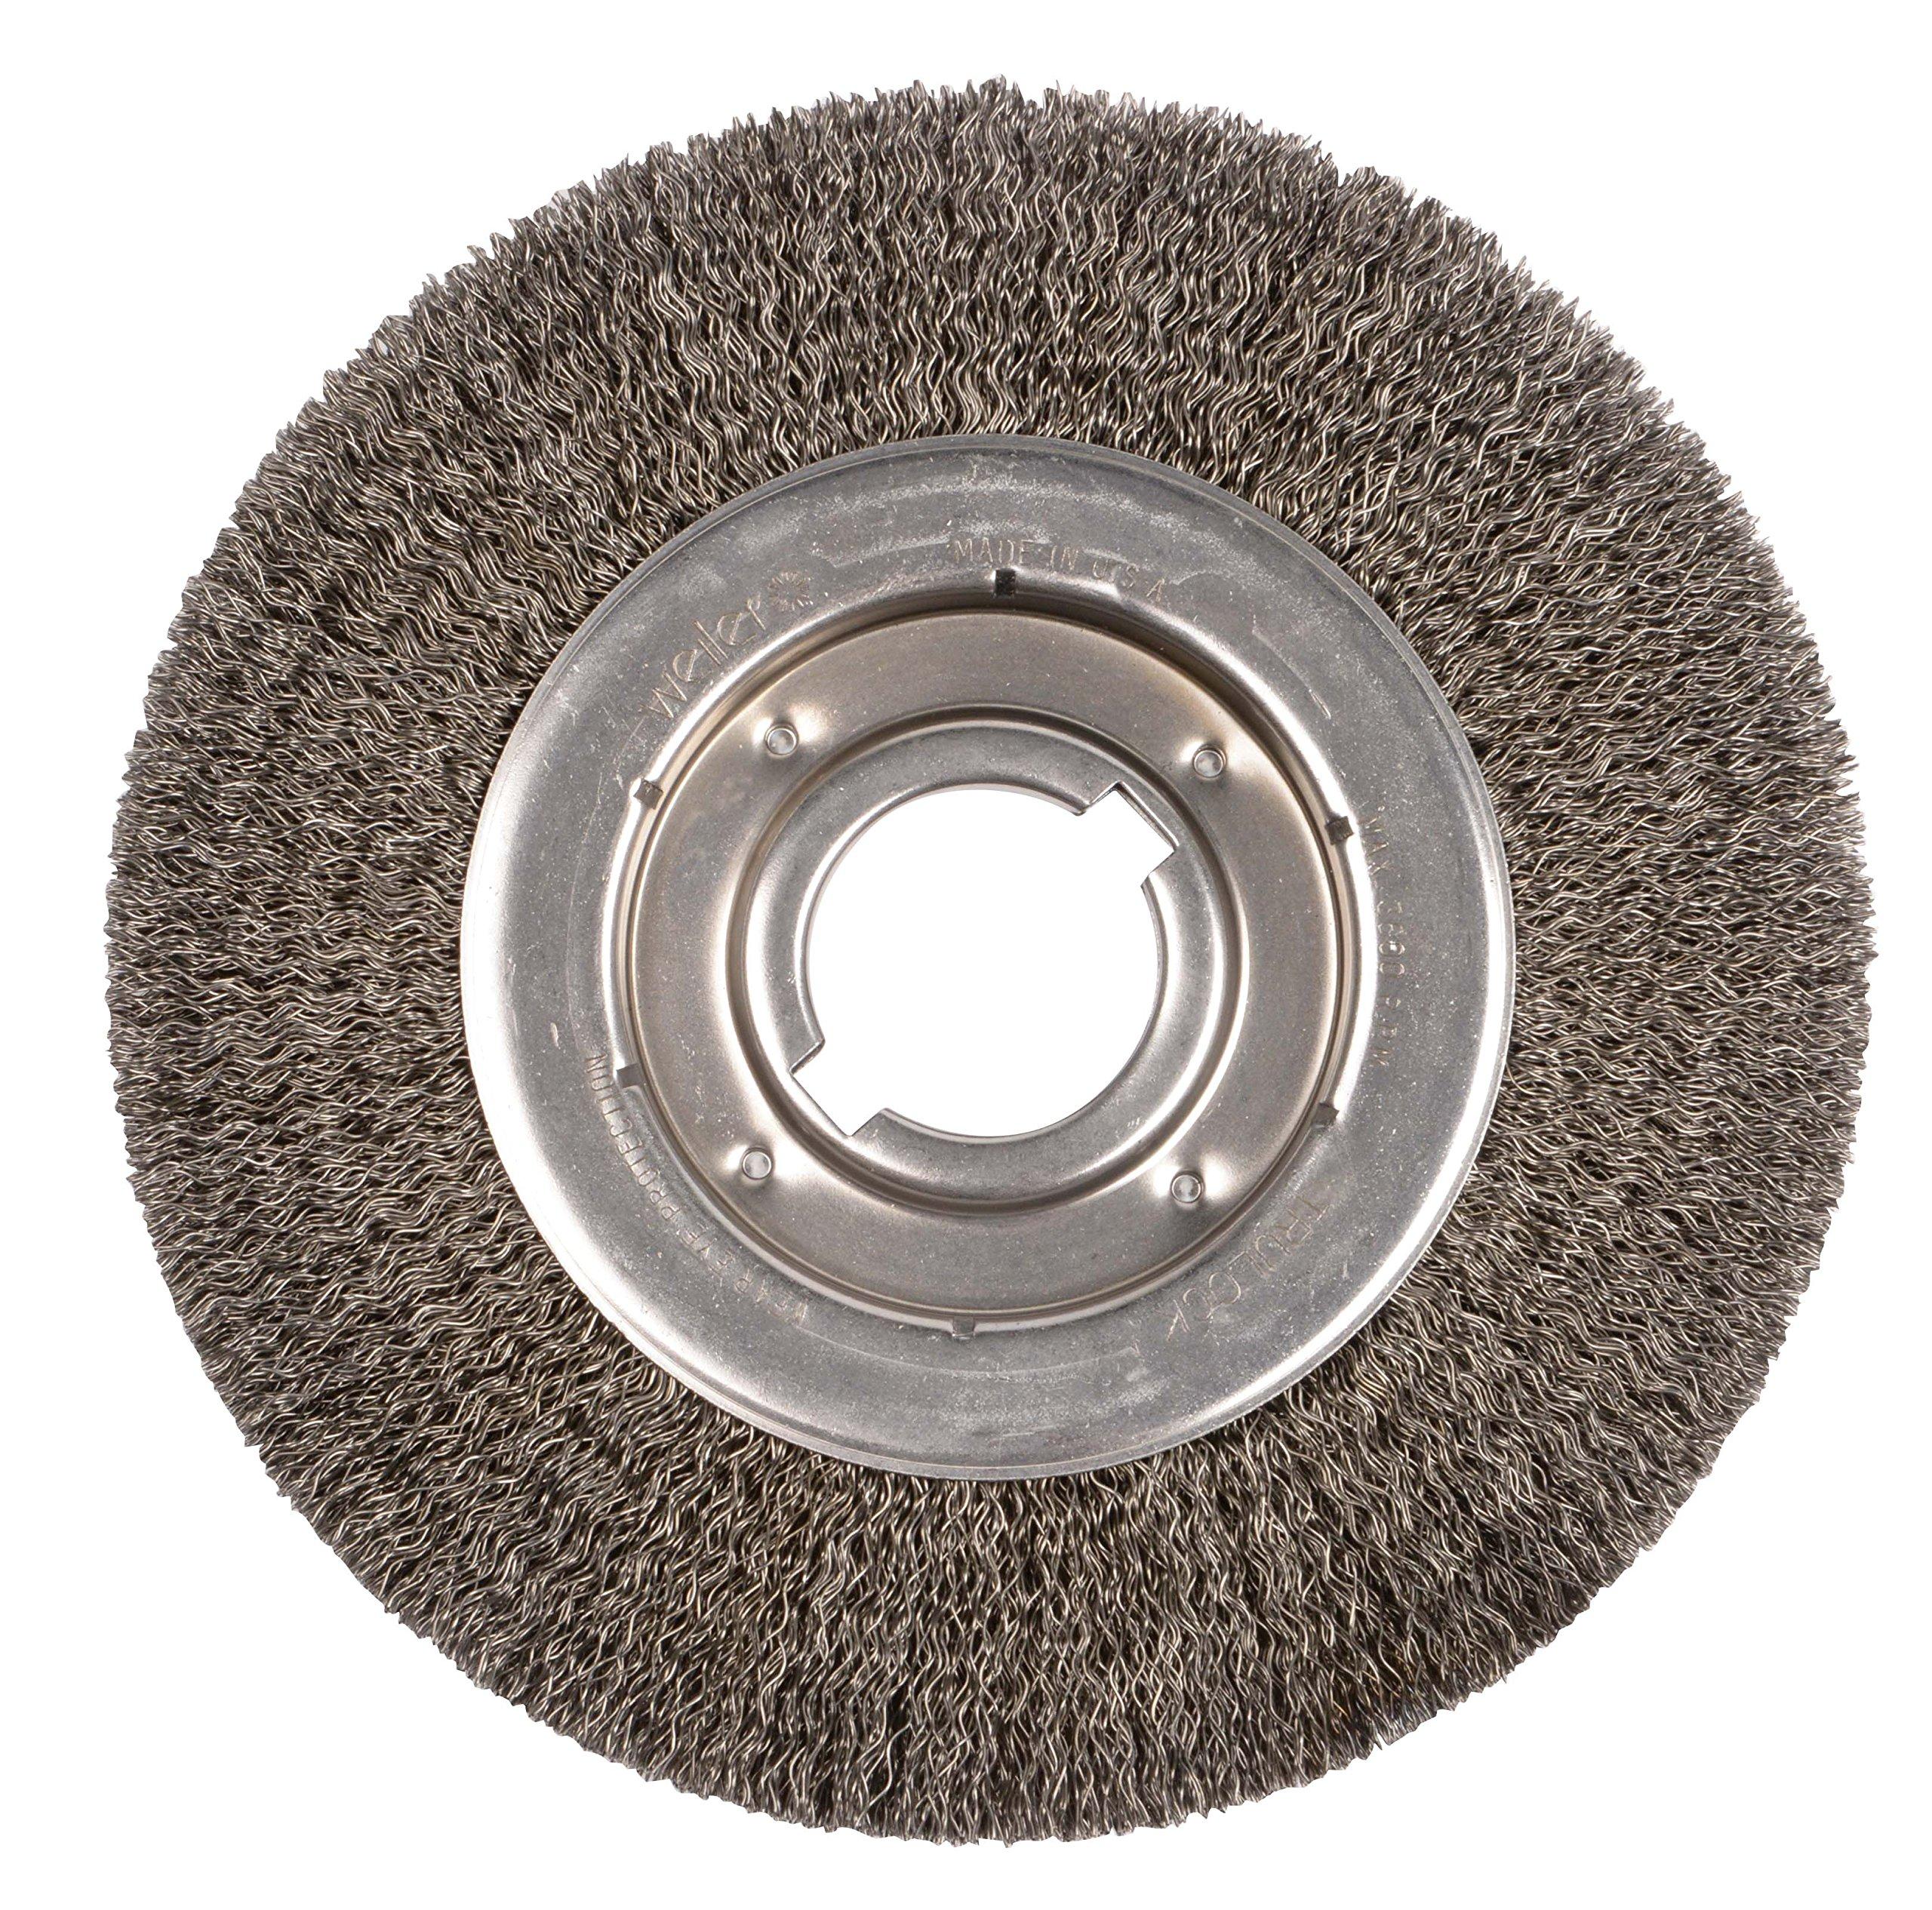 Weiler 6170 Face Crimped Wire Wheel, 10'' Medium, 0.20'' Steel Fill, 2'' Arbor Hole